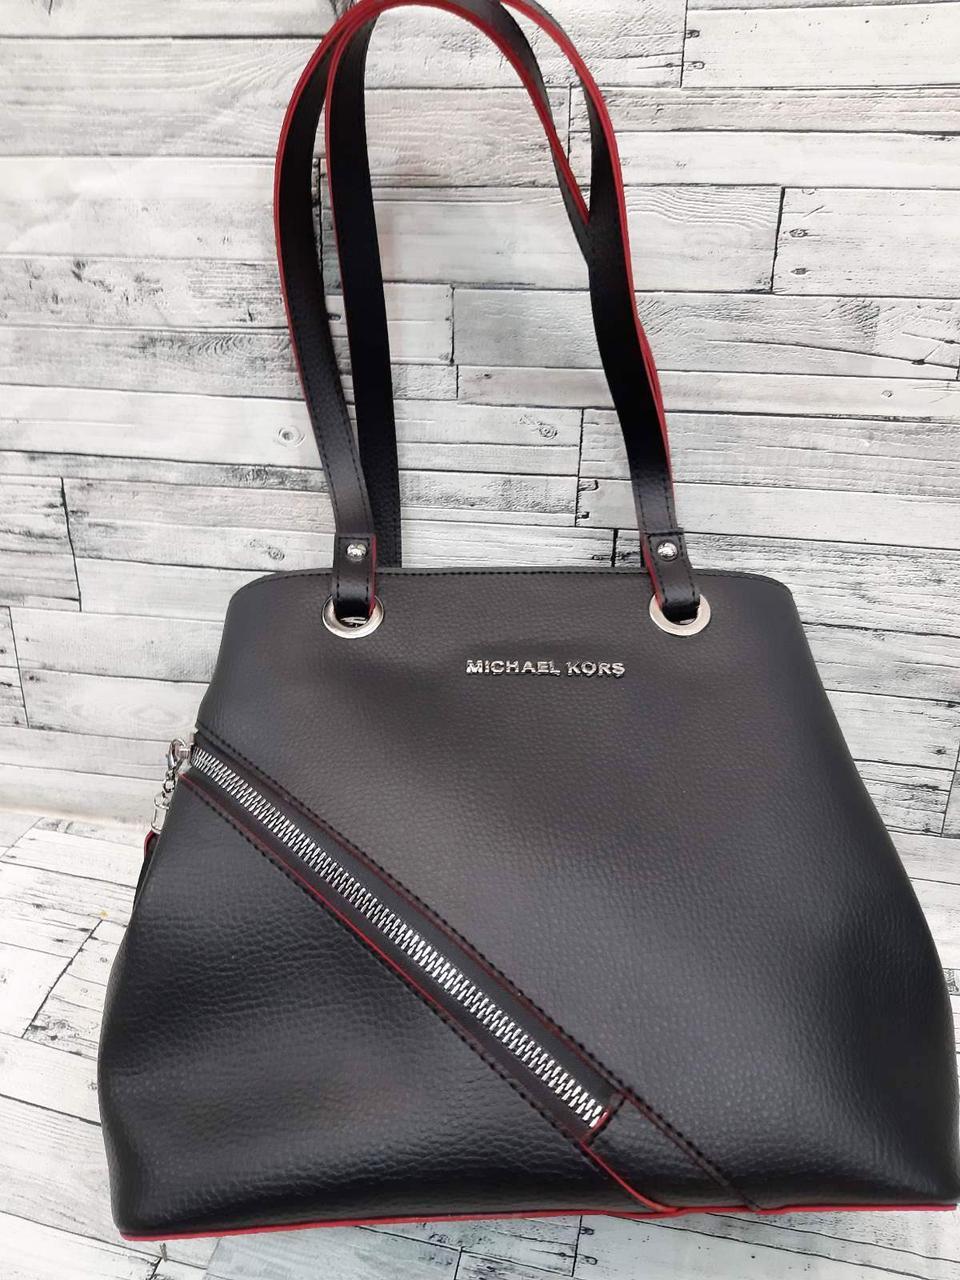 Женская сумка Mісhаеl Коrs, в стиле Майкл Корс MK, черная с красным ( код: IBG205BR )